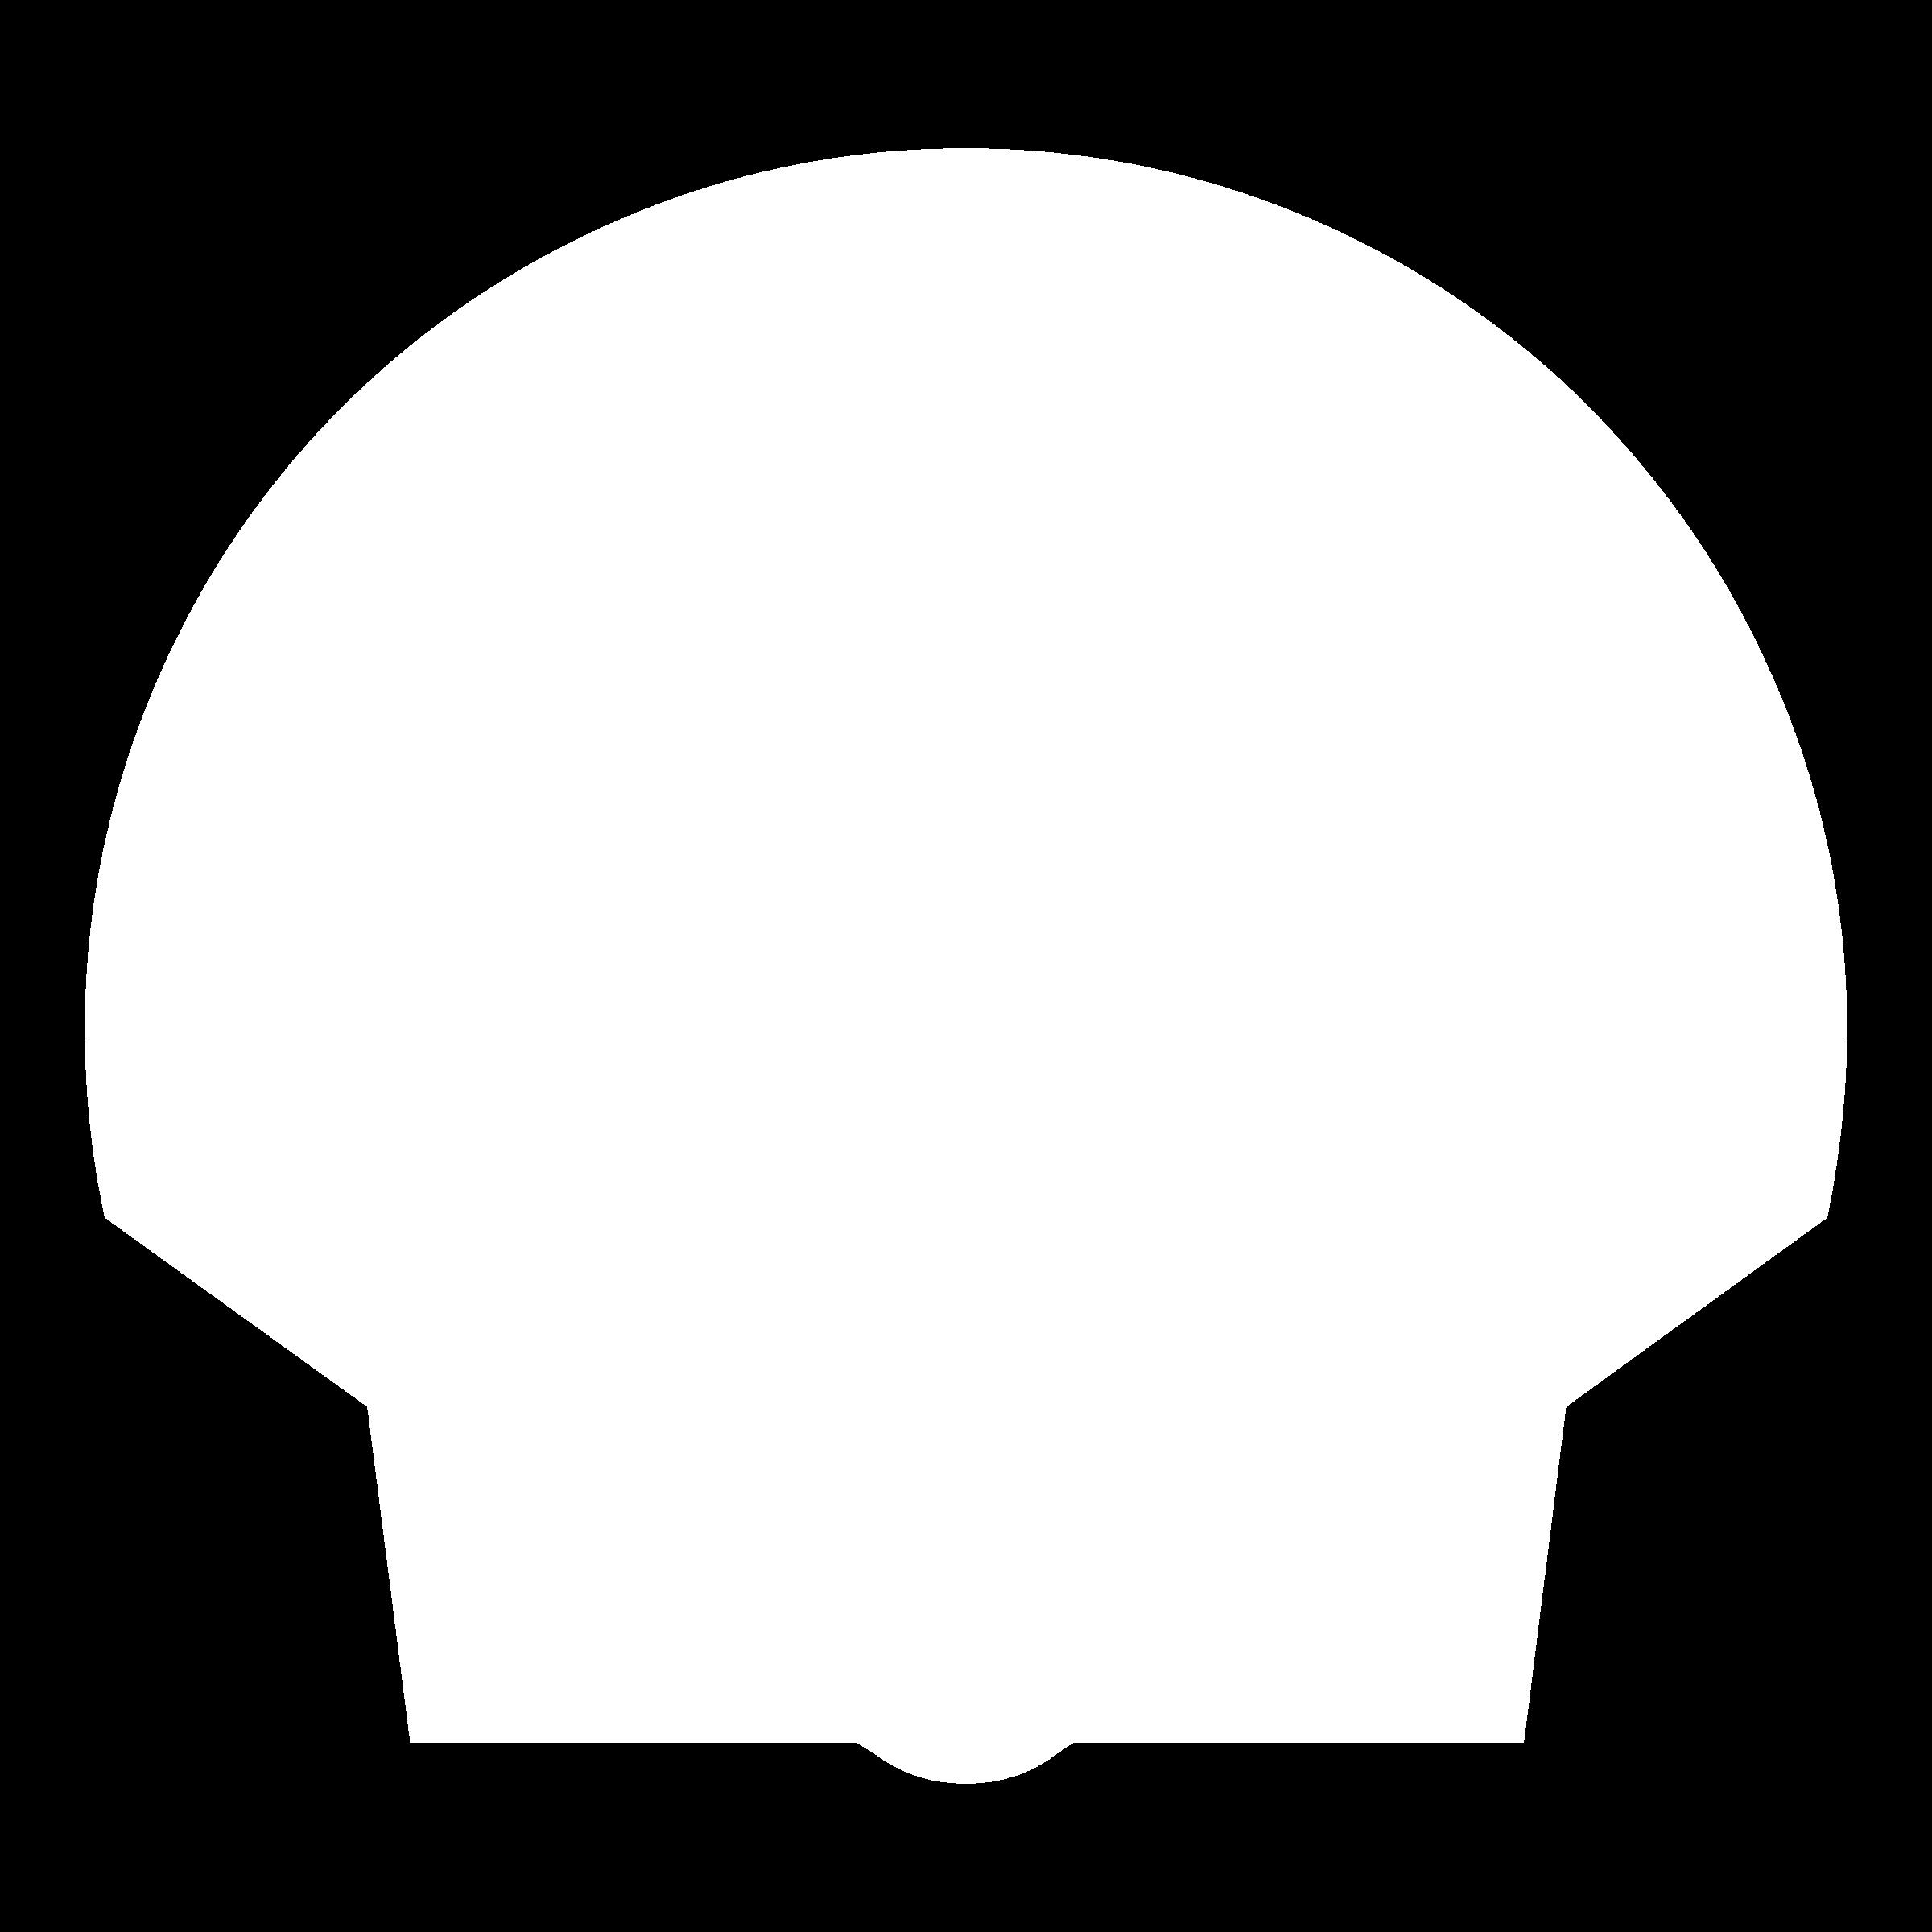 Shell Logo PNG Transparent & SVG Vector - Freebie Supply